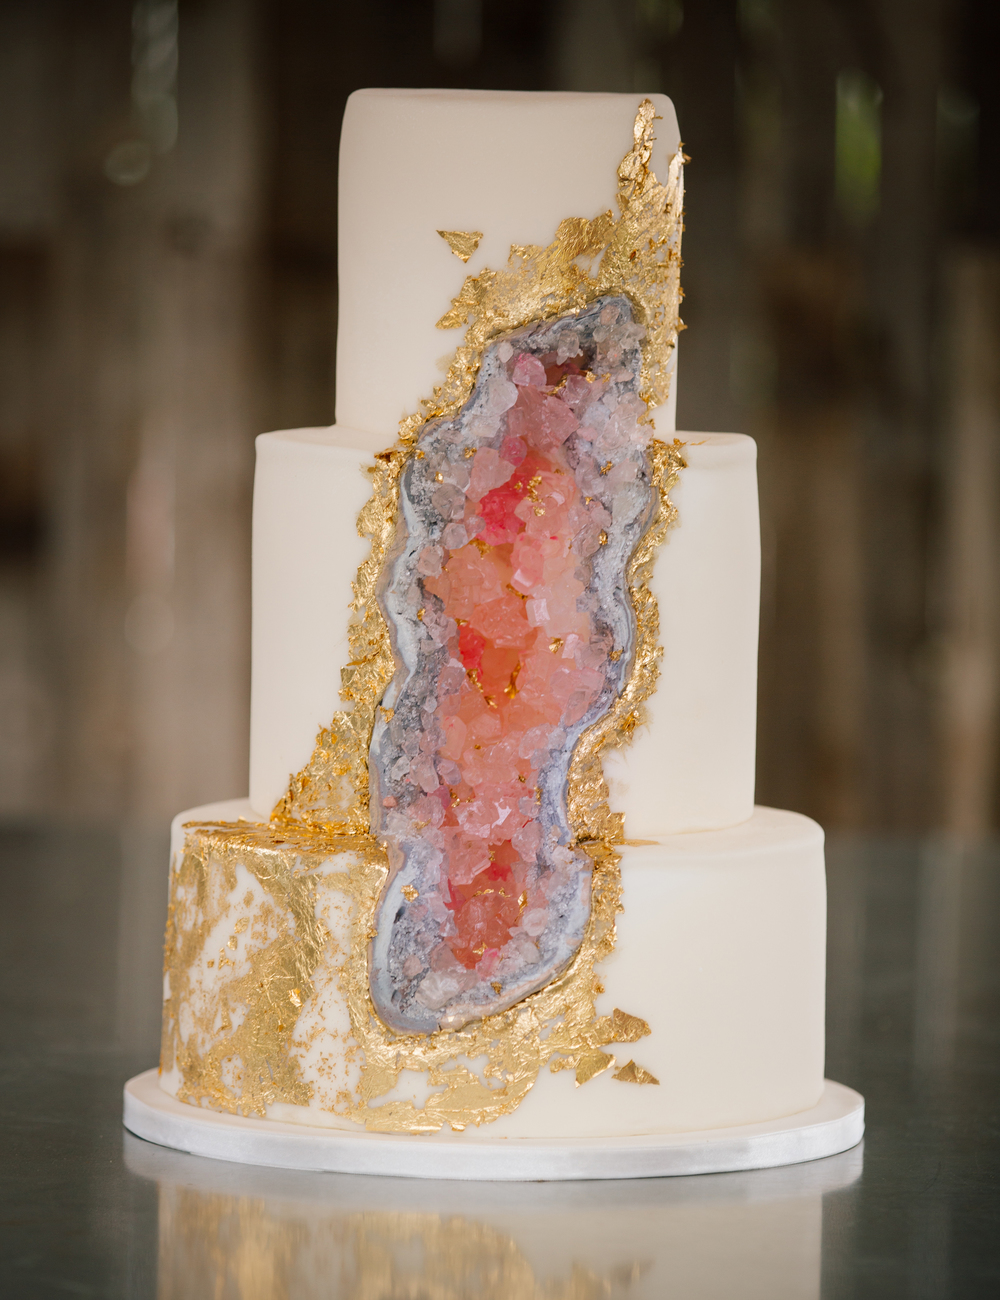 geode cake trend carrie 39 s cakes utah wedding cakes. Black Bedroom Furniture Sets. Home Design Ideas